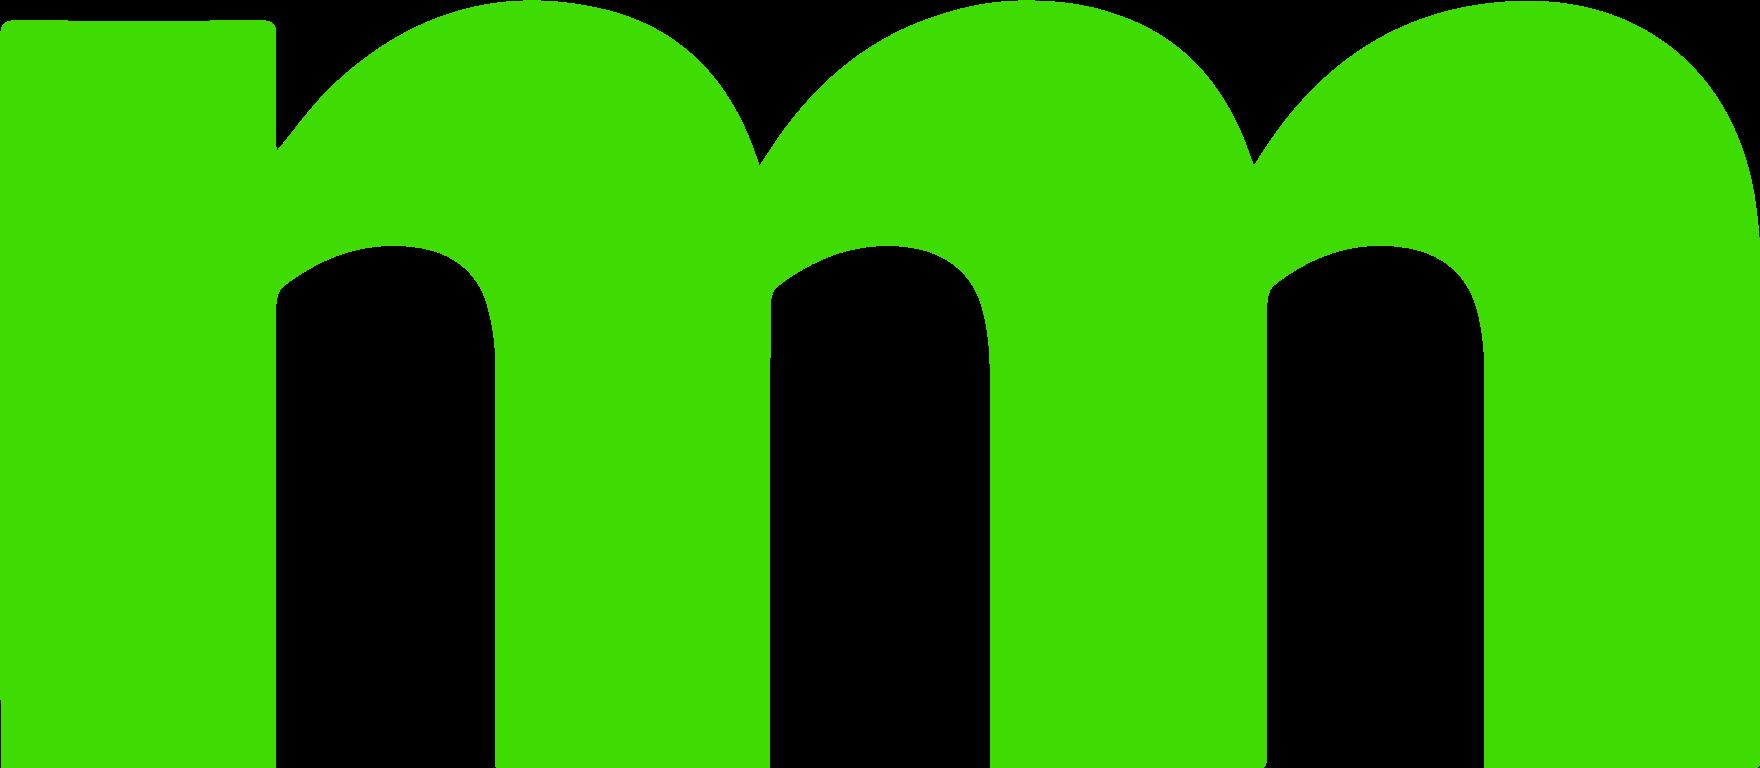 big-m-01